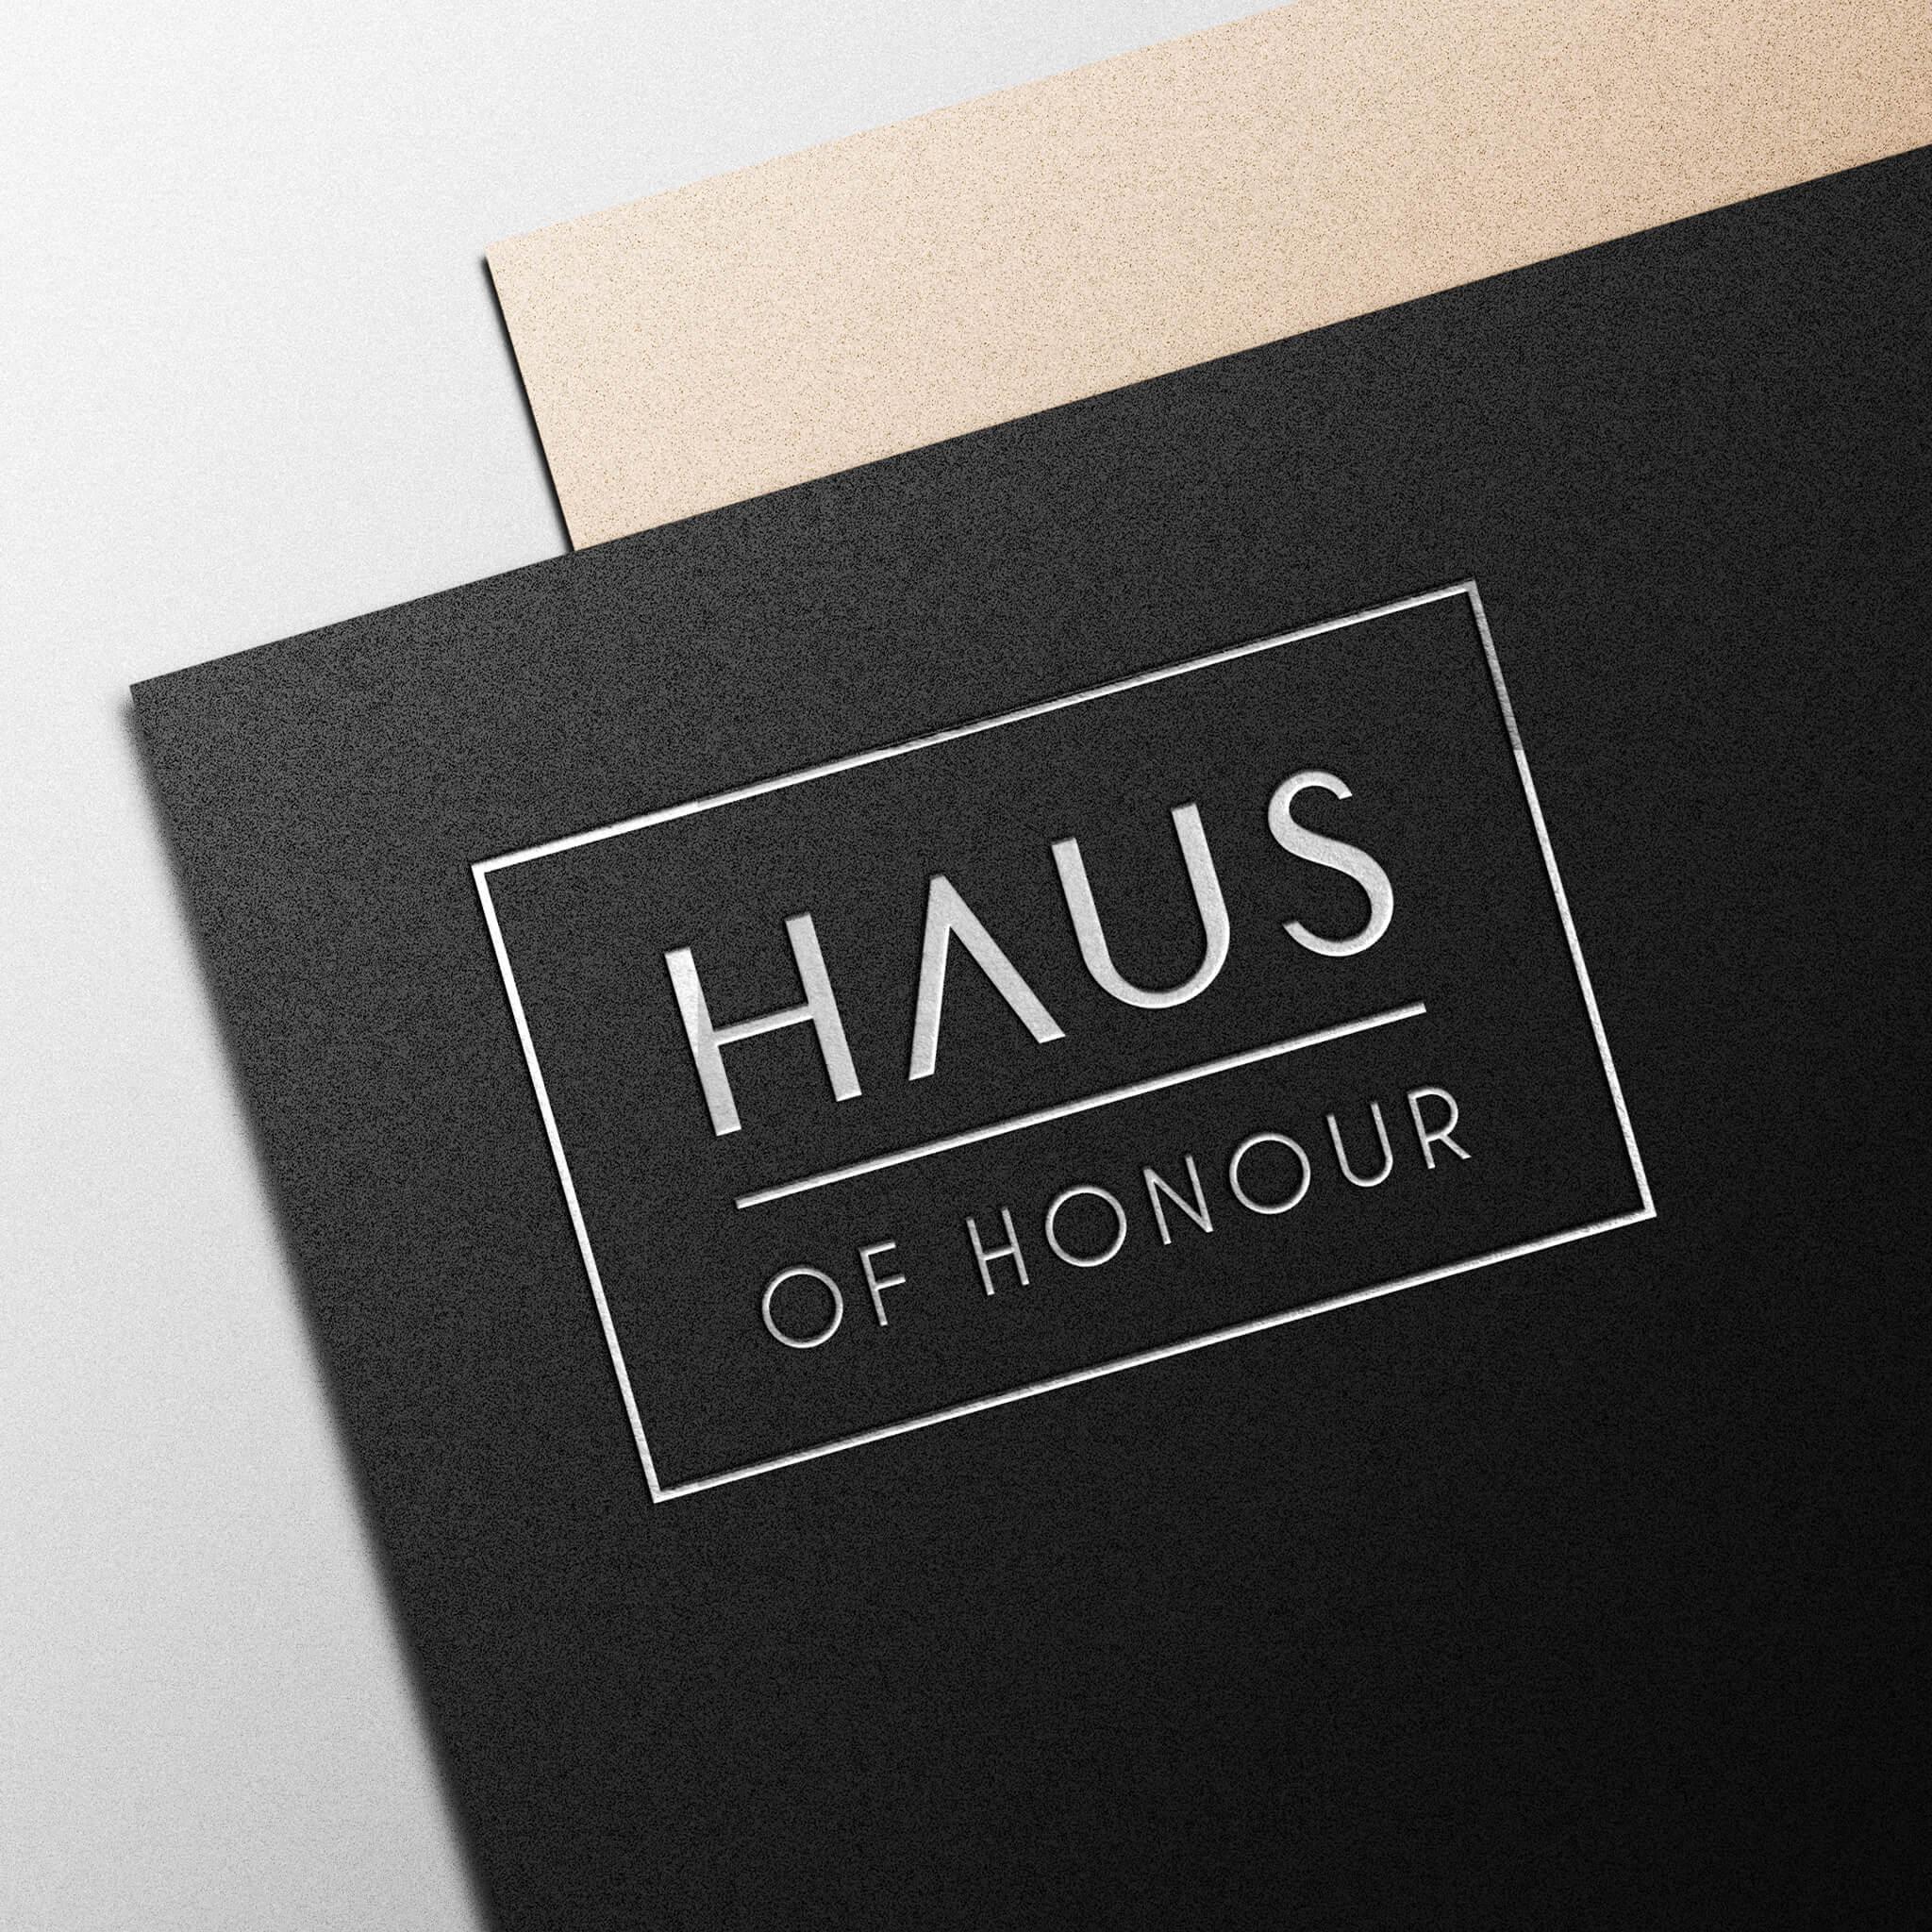 https://zanandcocreative.com.au/wp-content/uploads/2021/04/HAUS_Logo-Design-Branding-Design.jpg